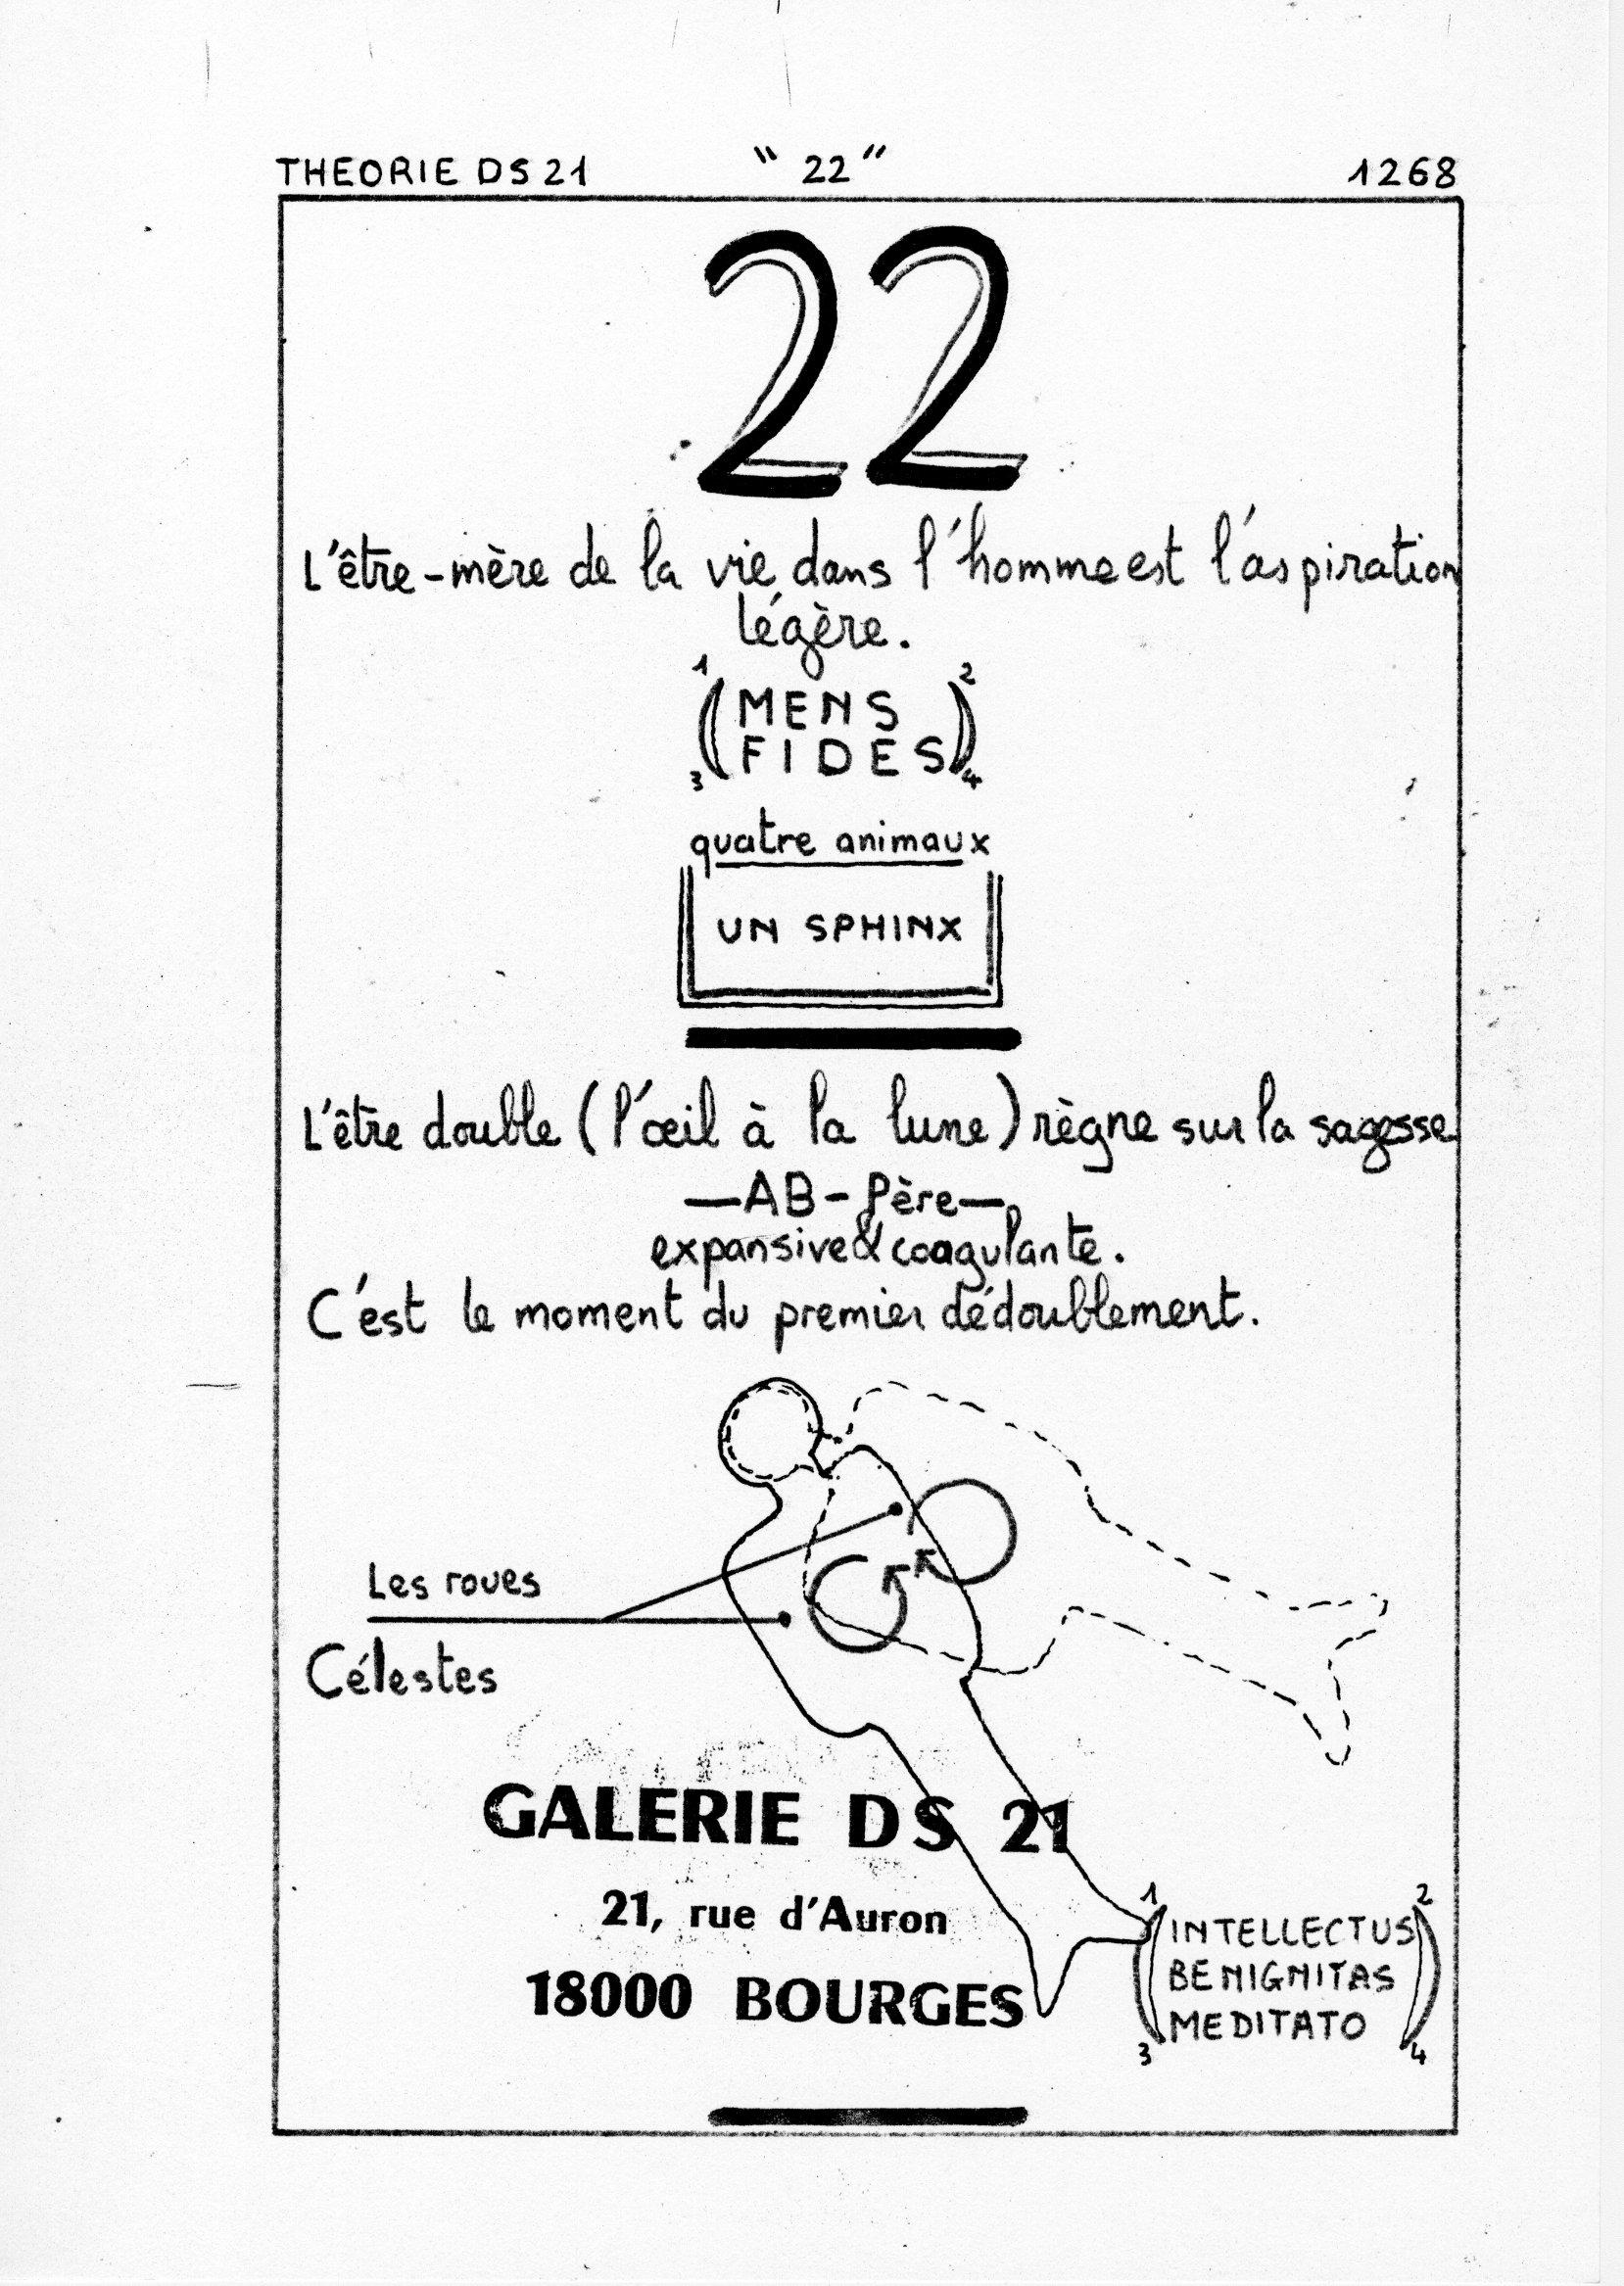 page 1268 Théorie D.S. 21 22